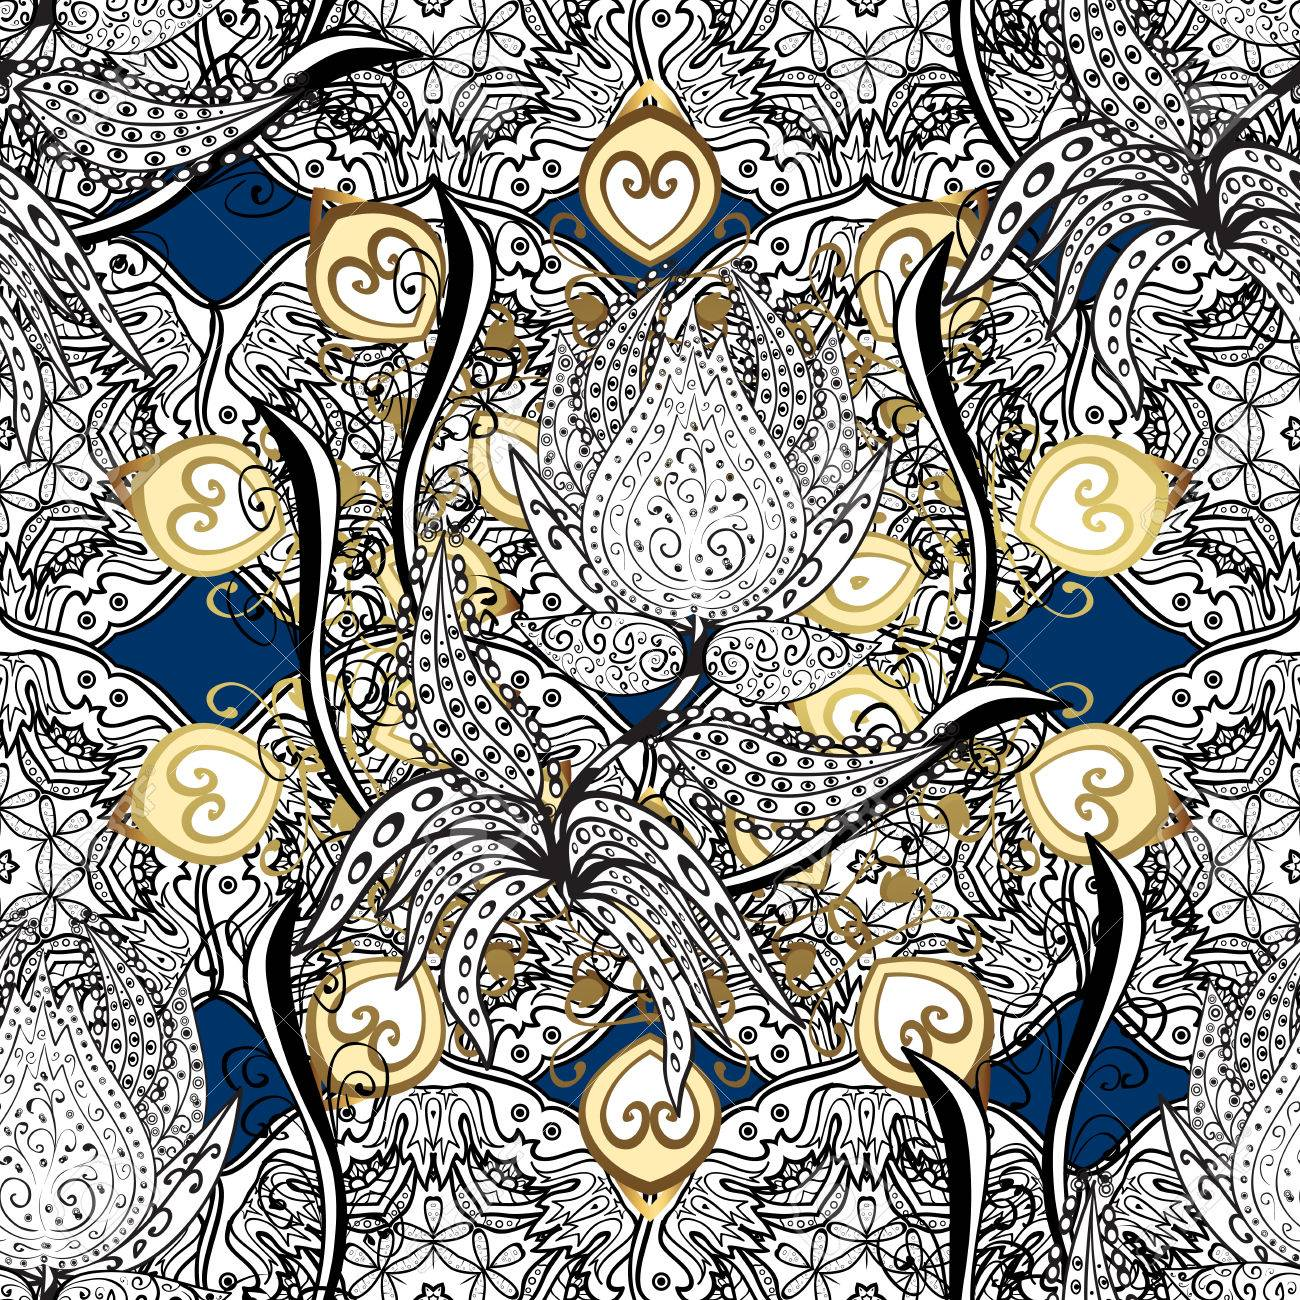 oscuro azul real del damasco barroco ilustracin sin patrn papel tapiz de fondo azul con adornos